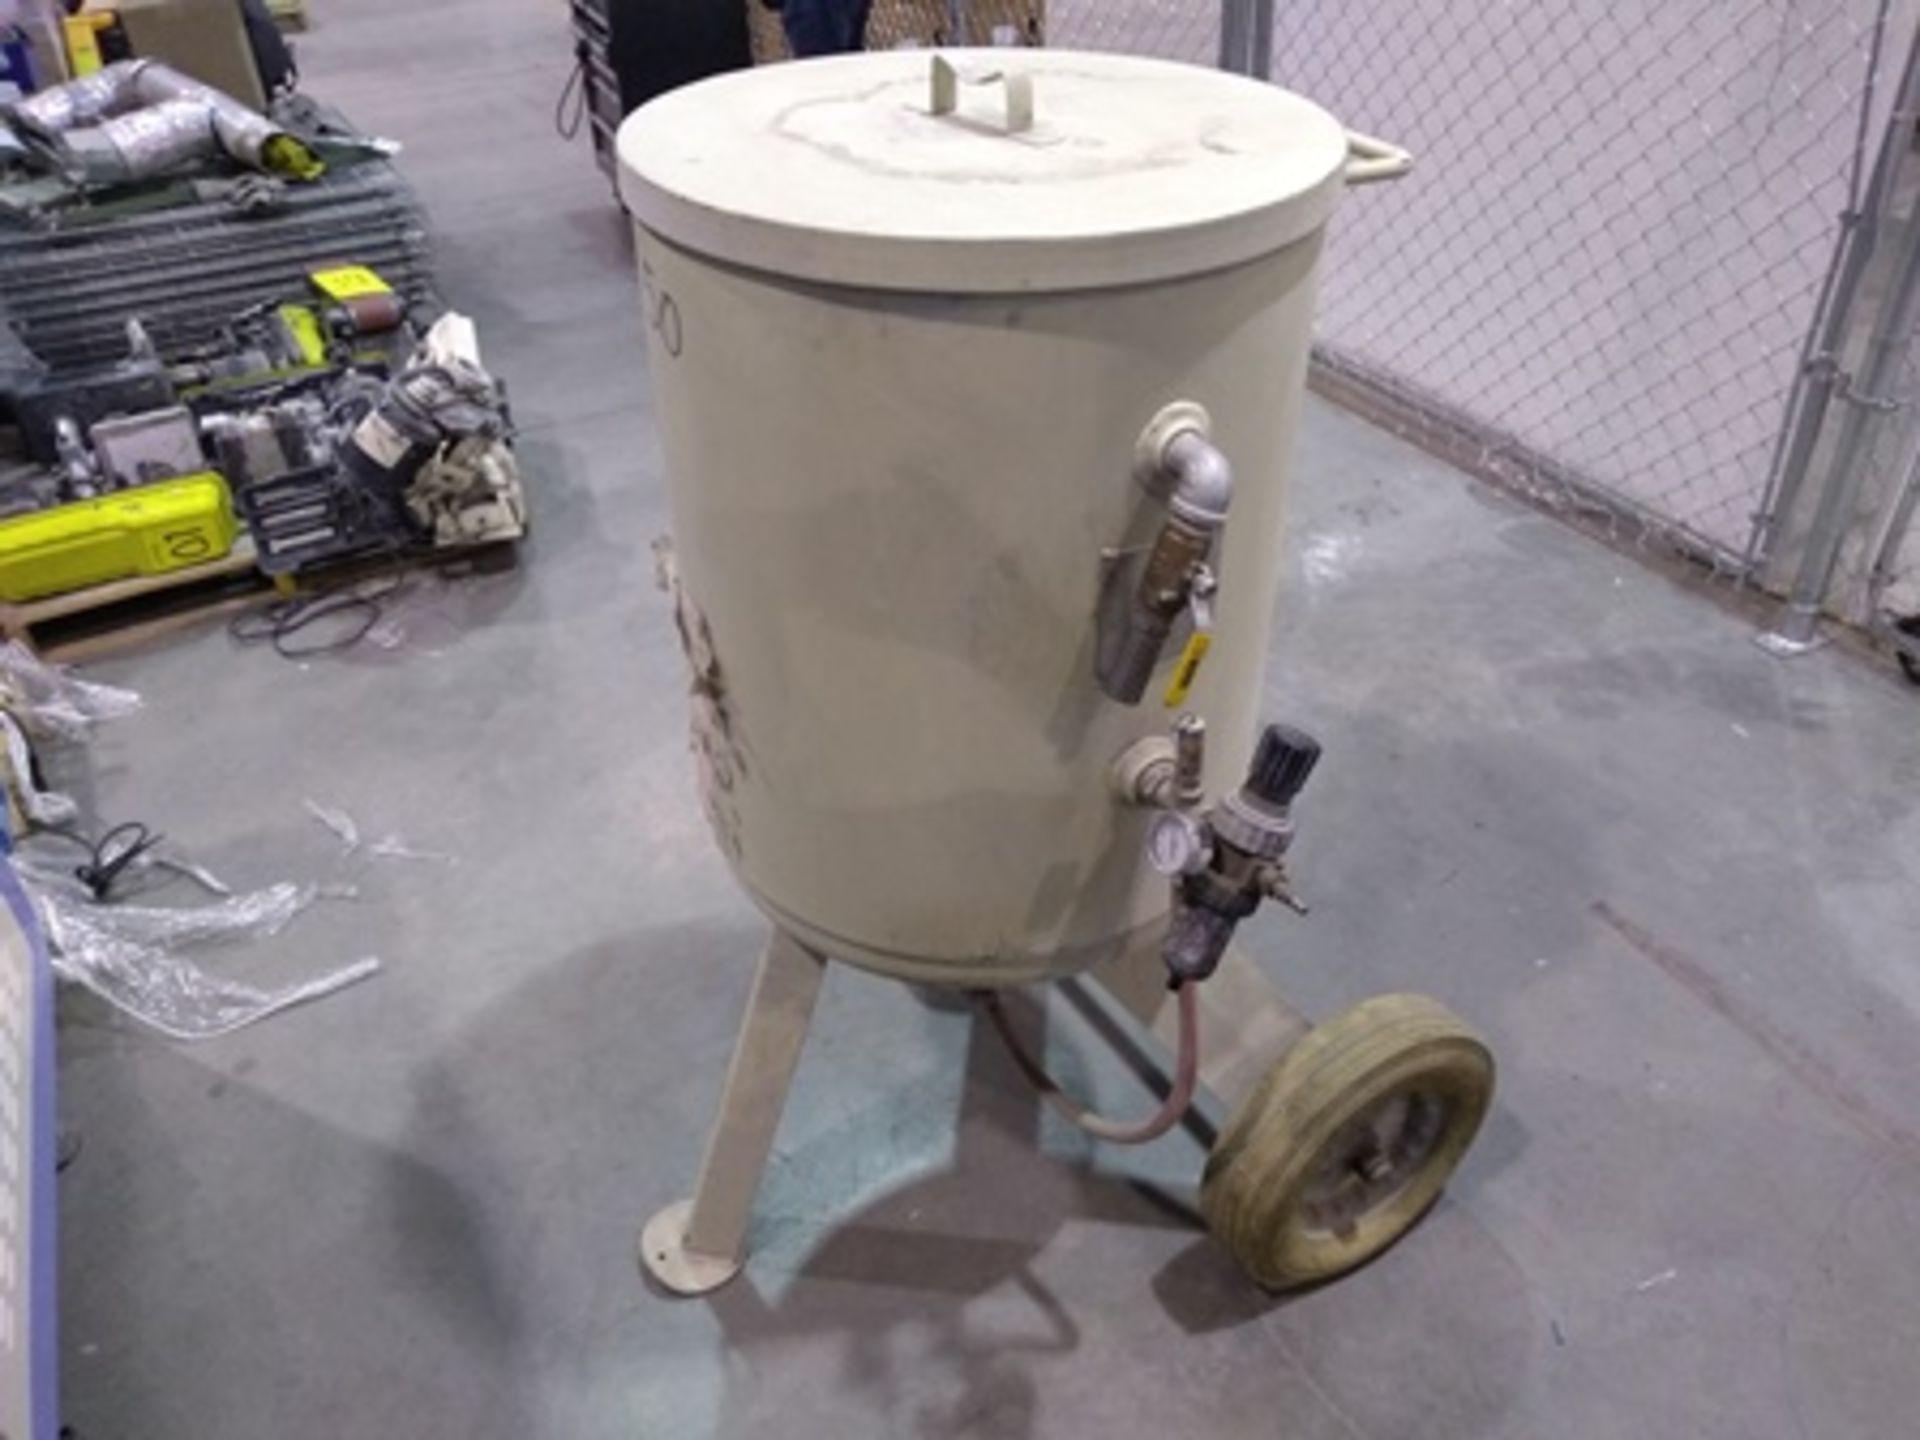 Lot 34 - Clemco blast machine, year 2013, capacity of 6 cubic feet & max pressure 100 psi.